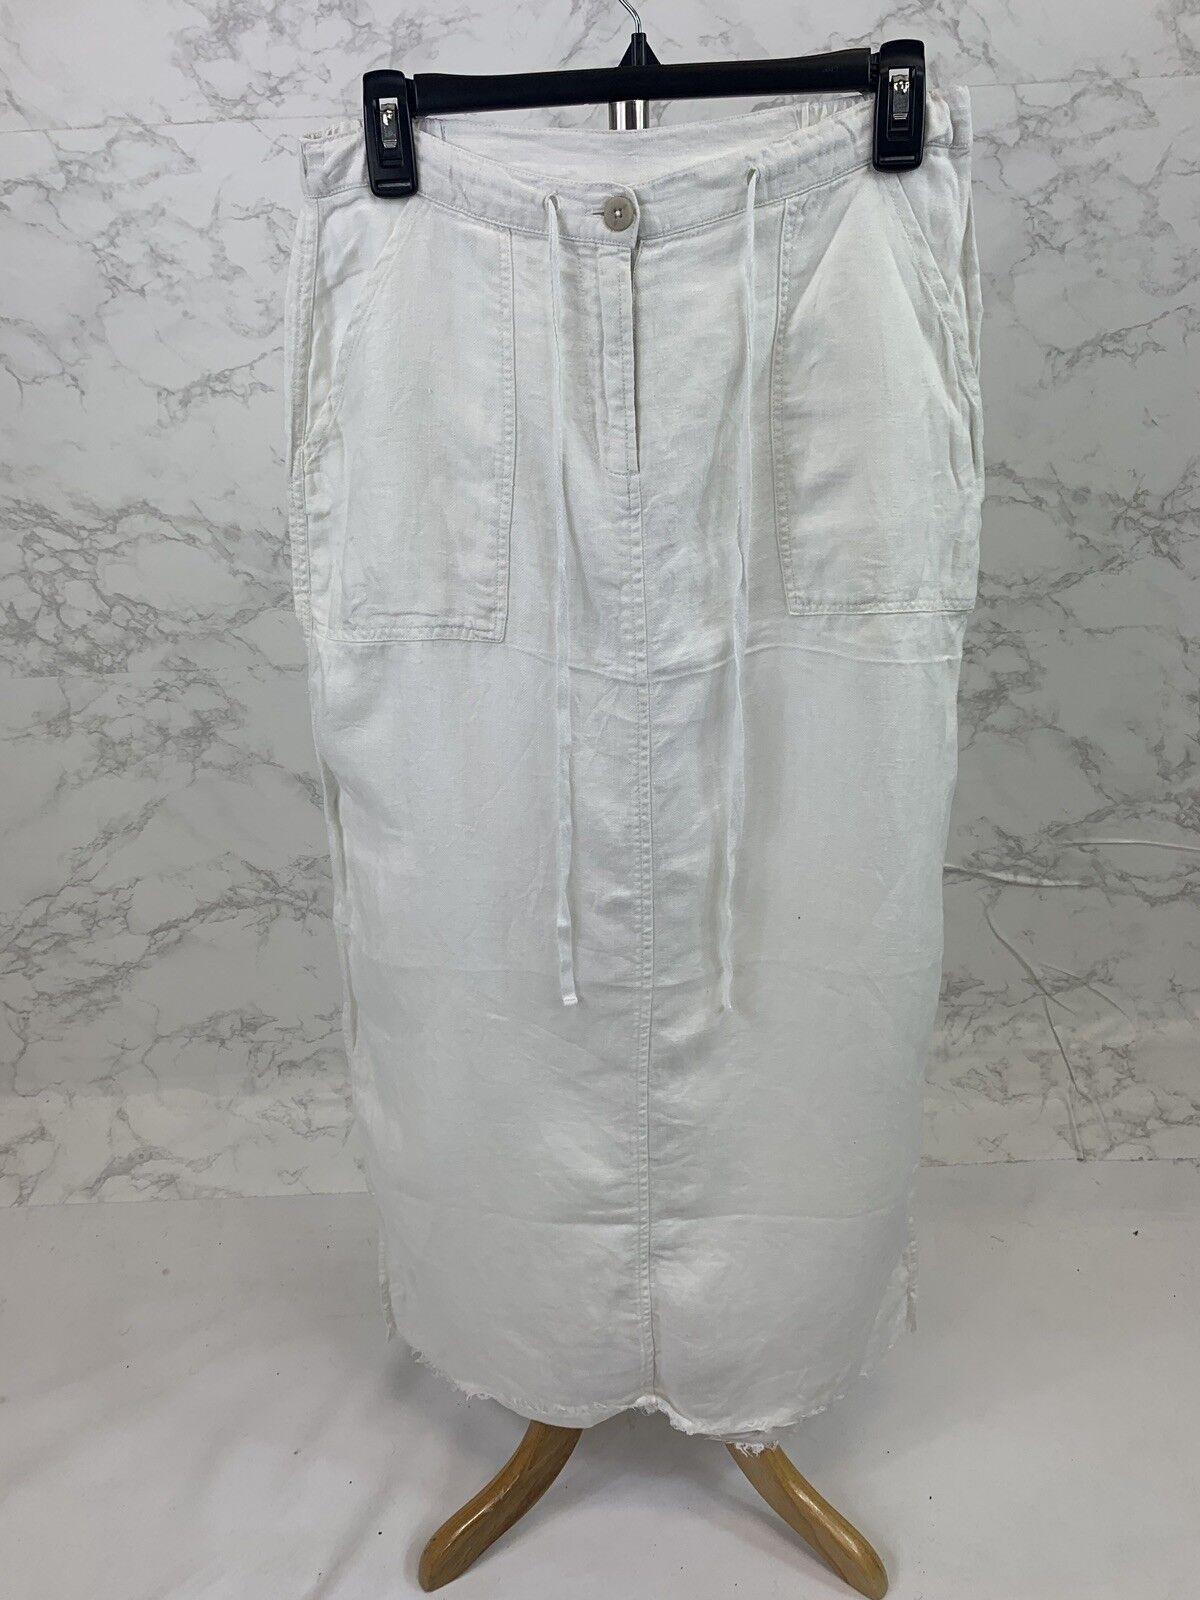 Free People Women's White Linen Maxi Skirt Size Small